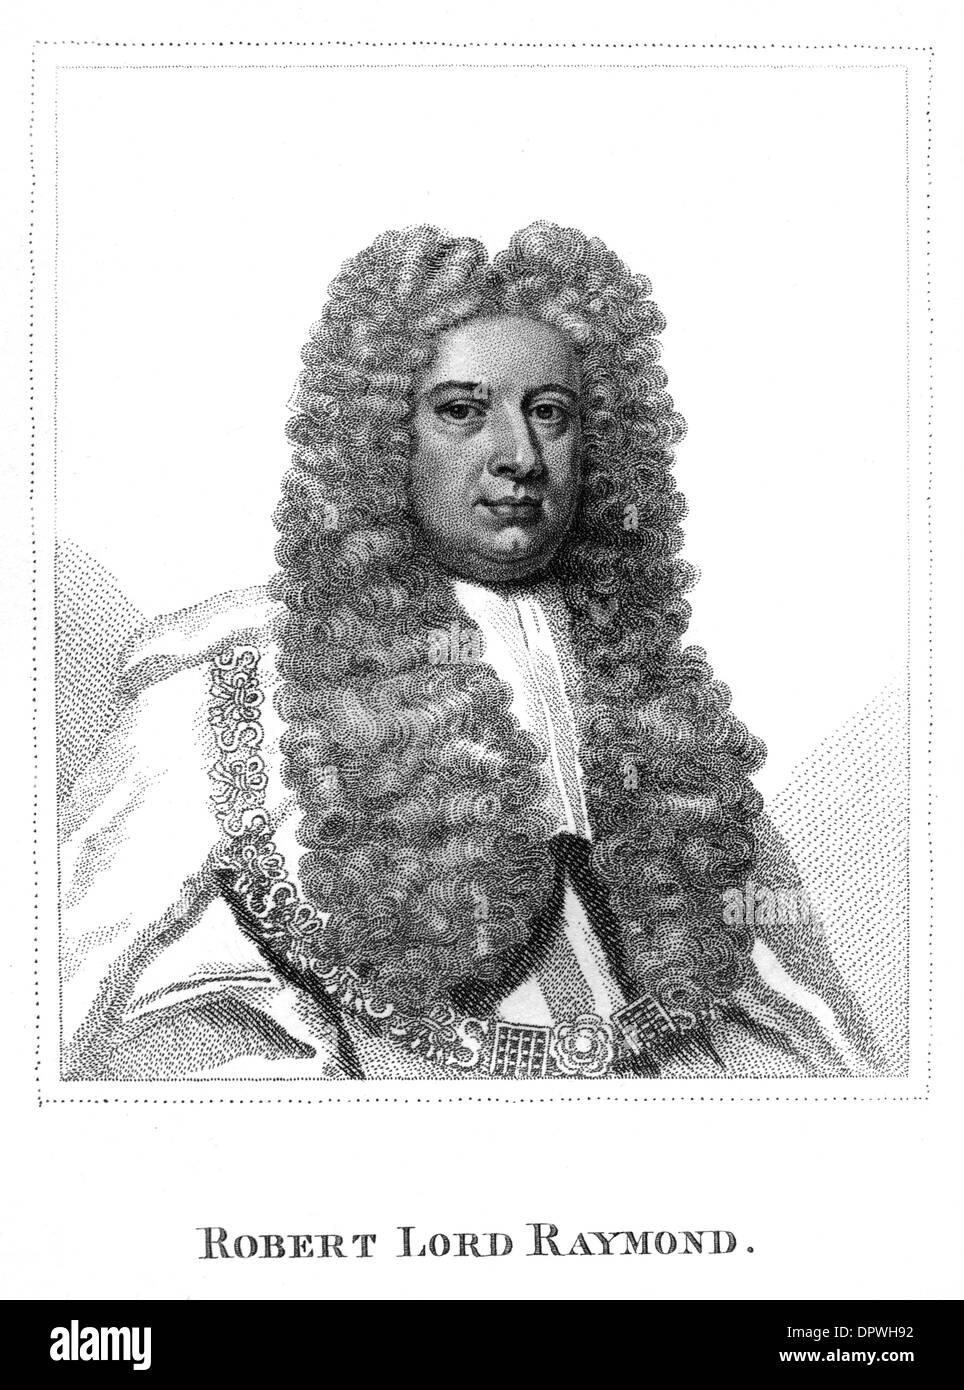 ROBERT BARON RAYMOND - Stock Image